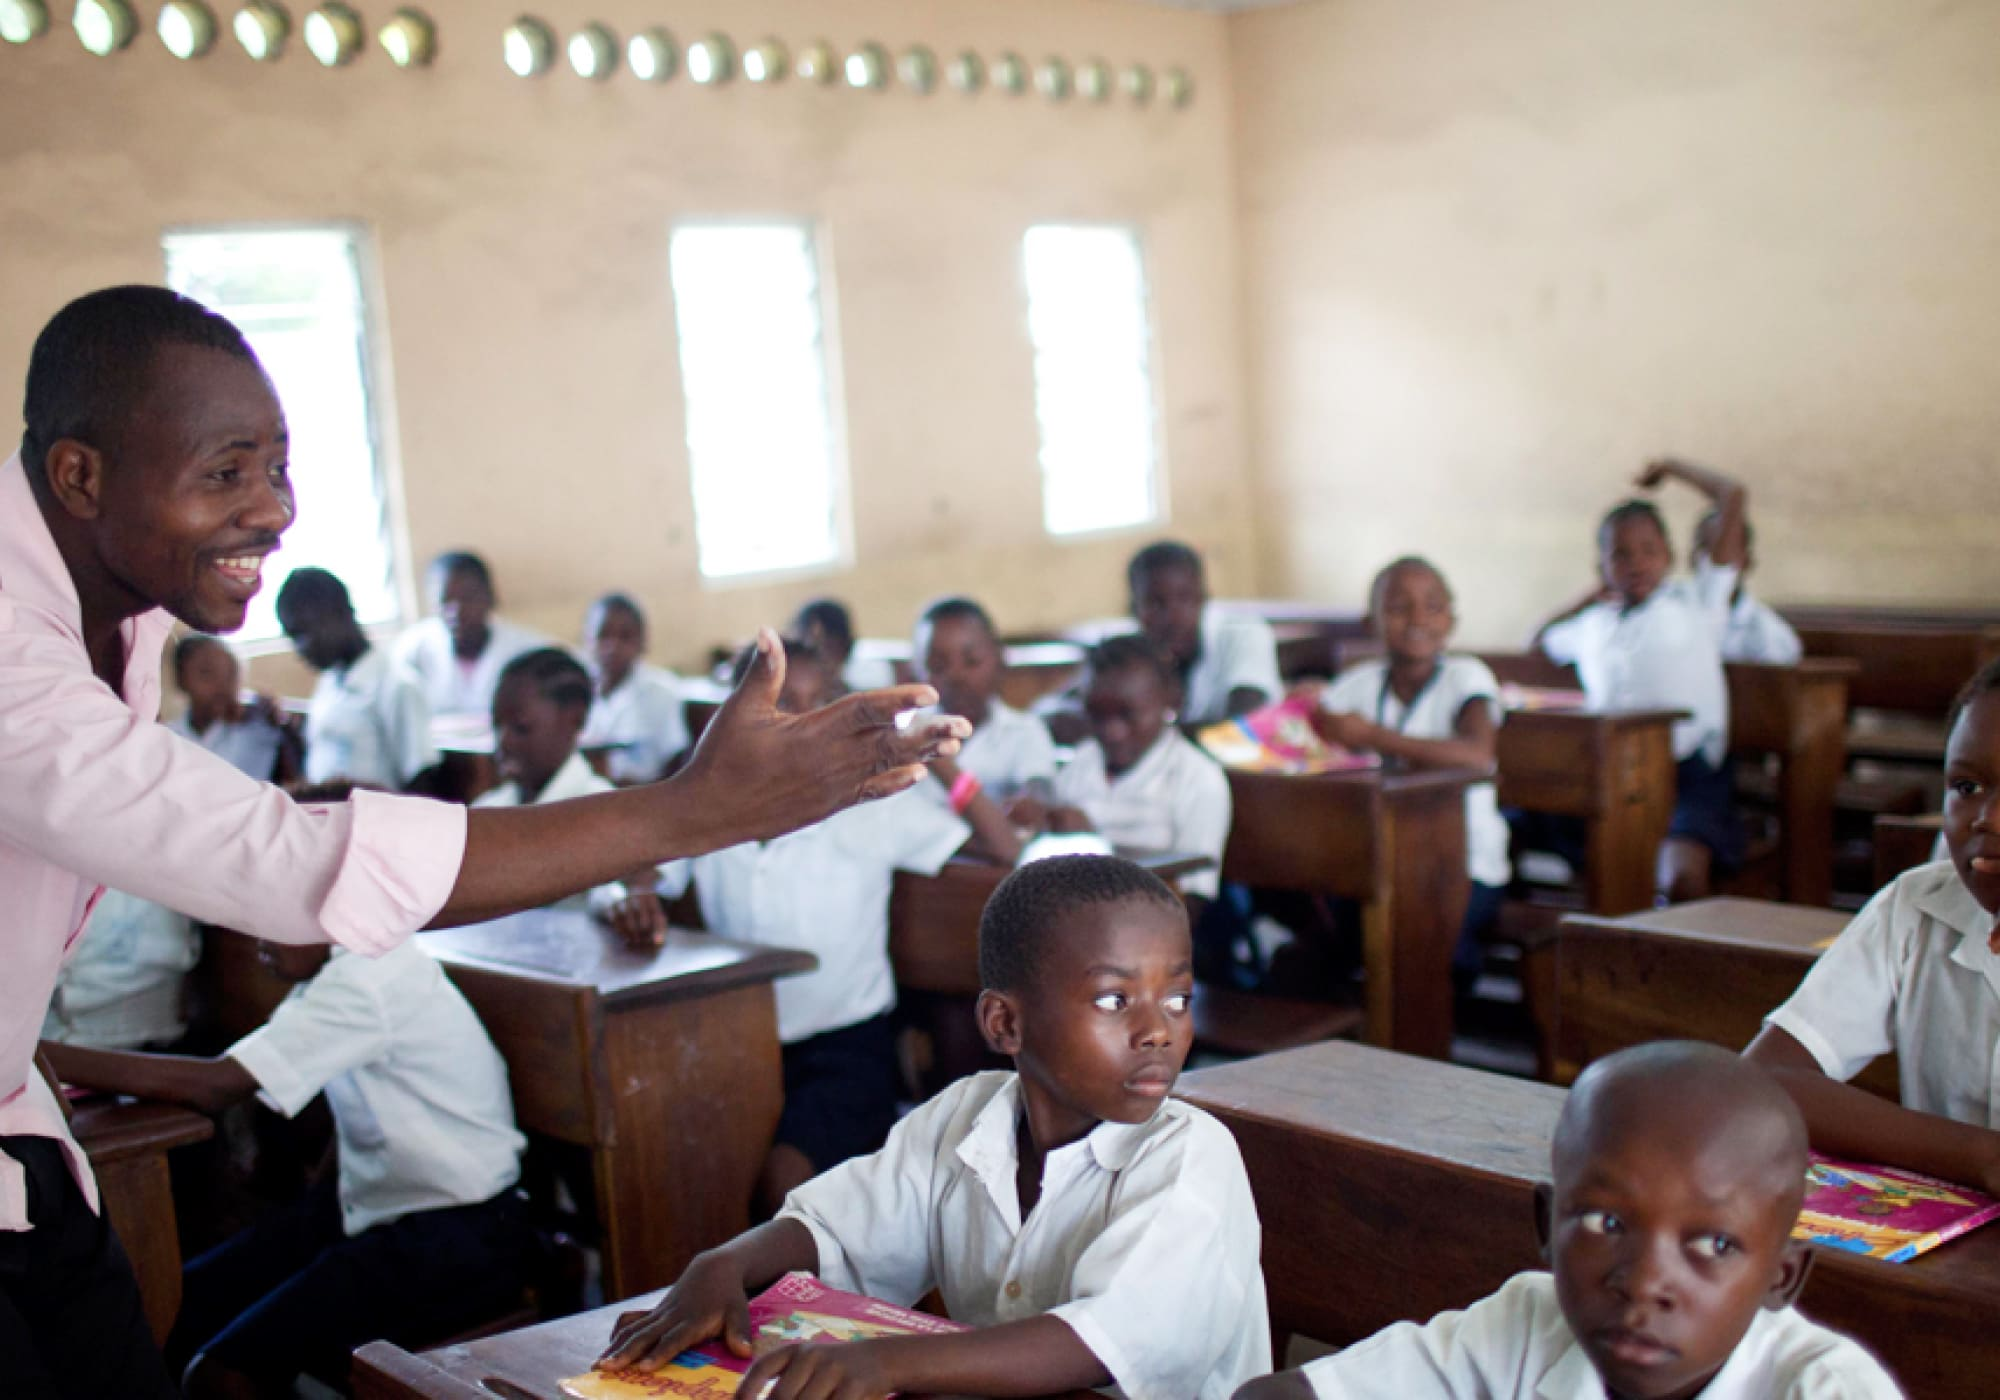 Enable a primary school teacher training